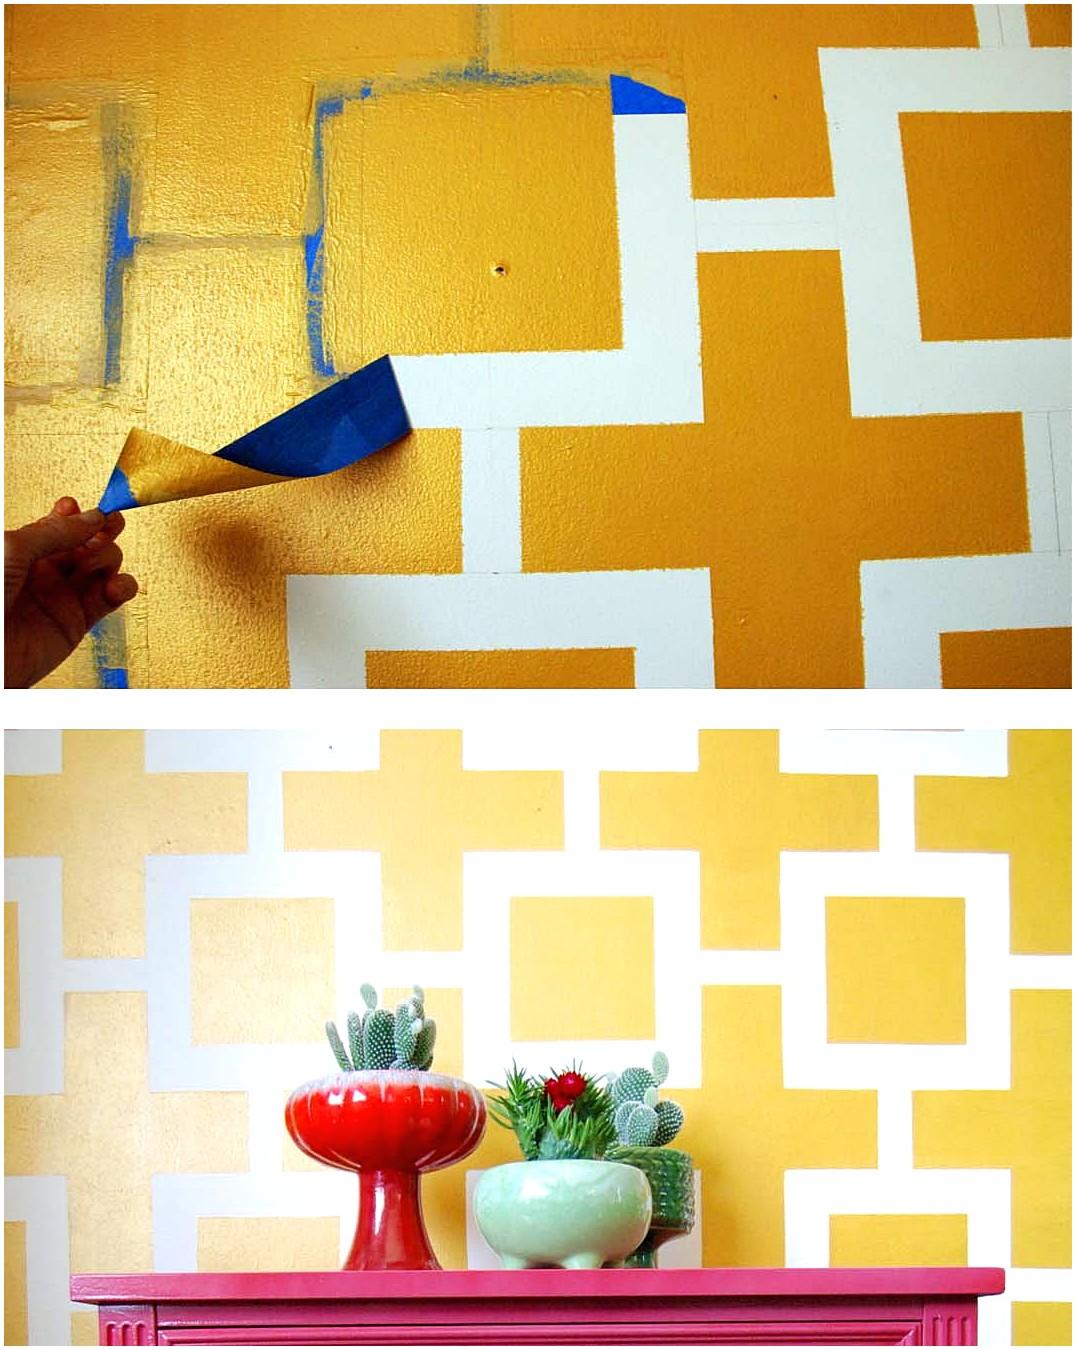 Hiasan Dinding Wallpaper Kamar Buatan Sendiri Minimalis